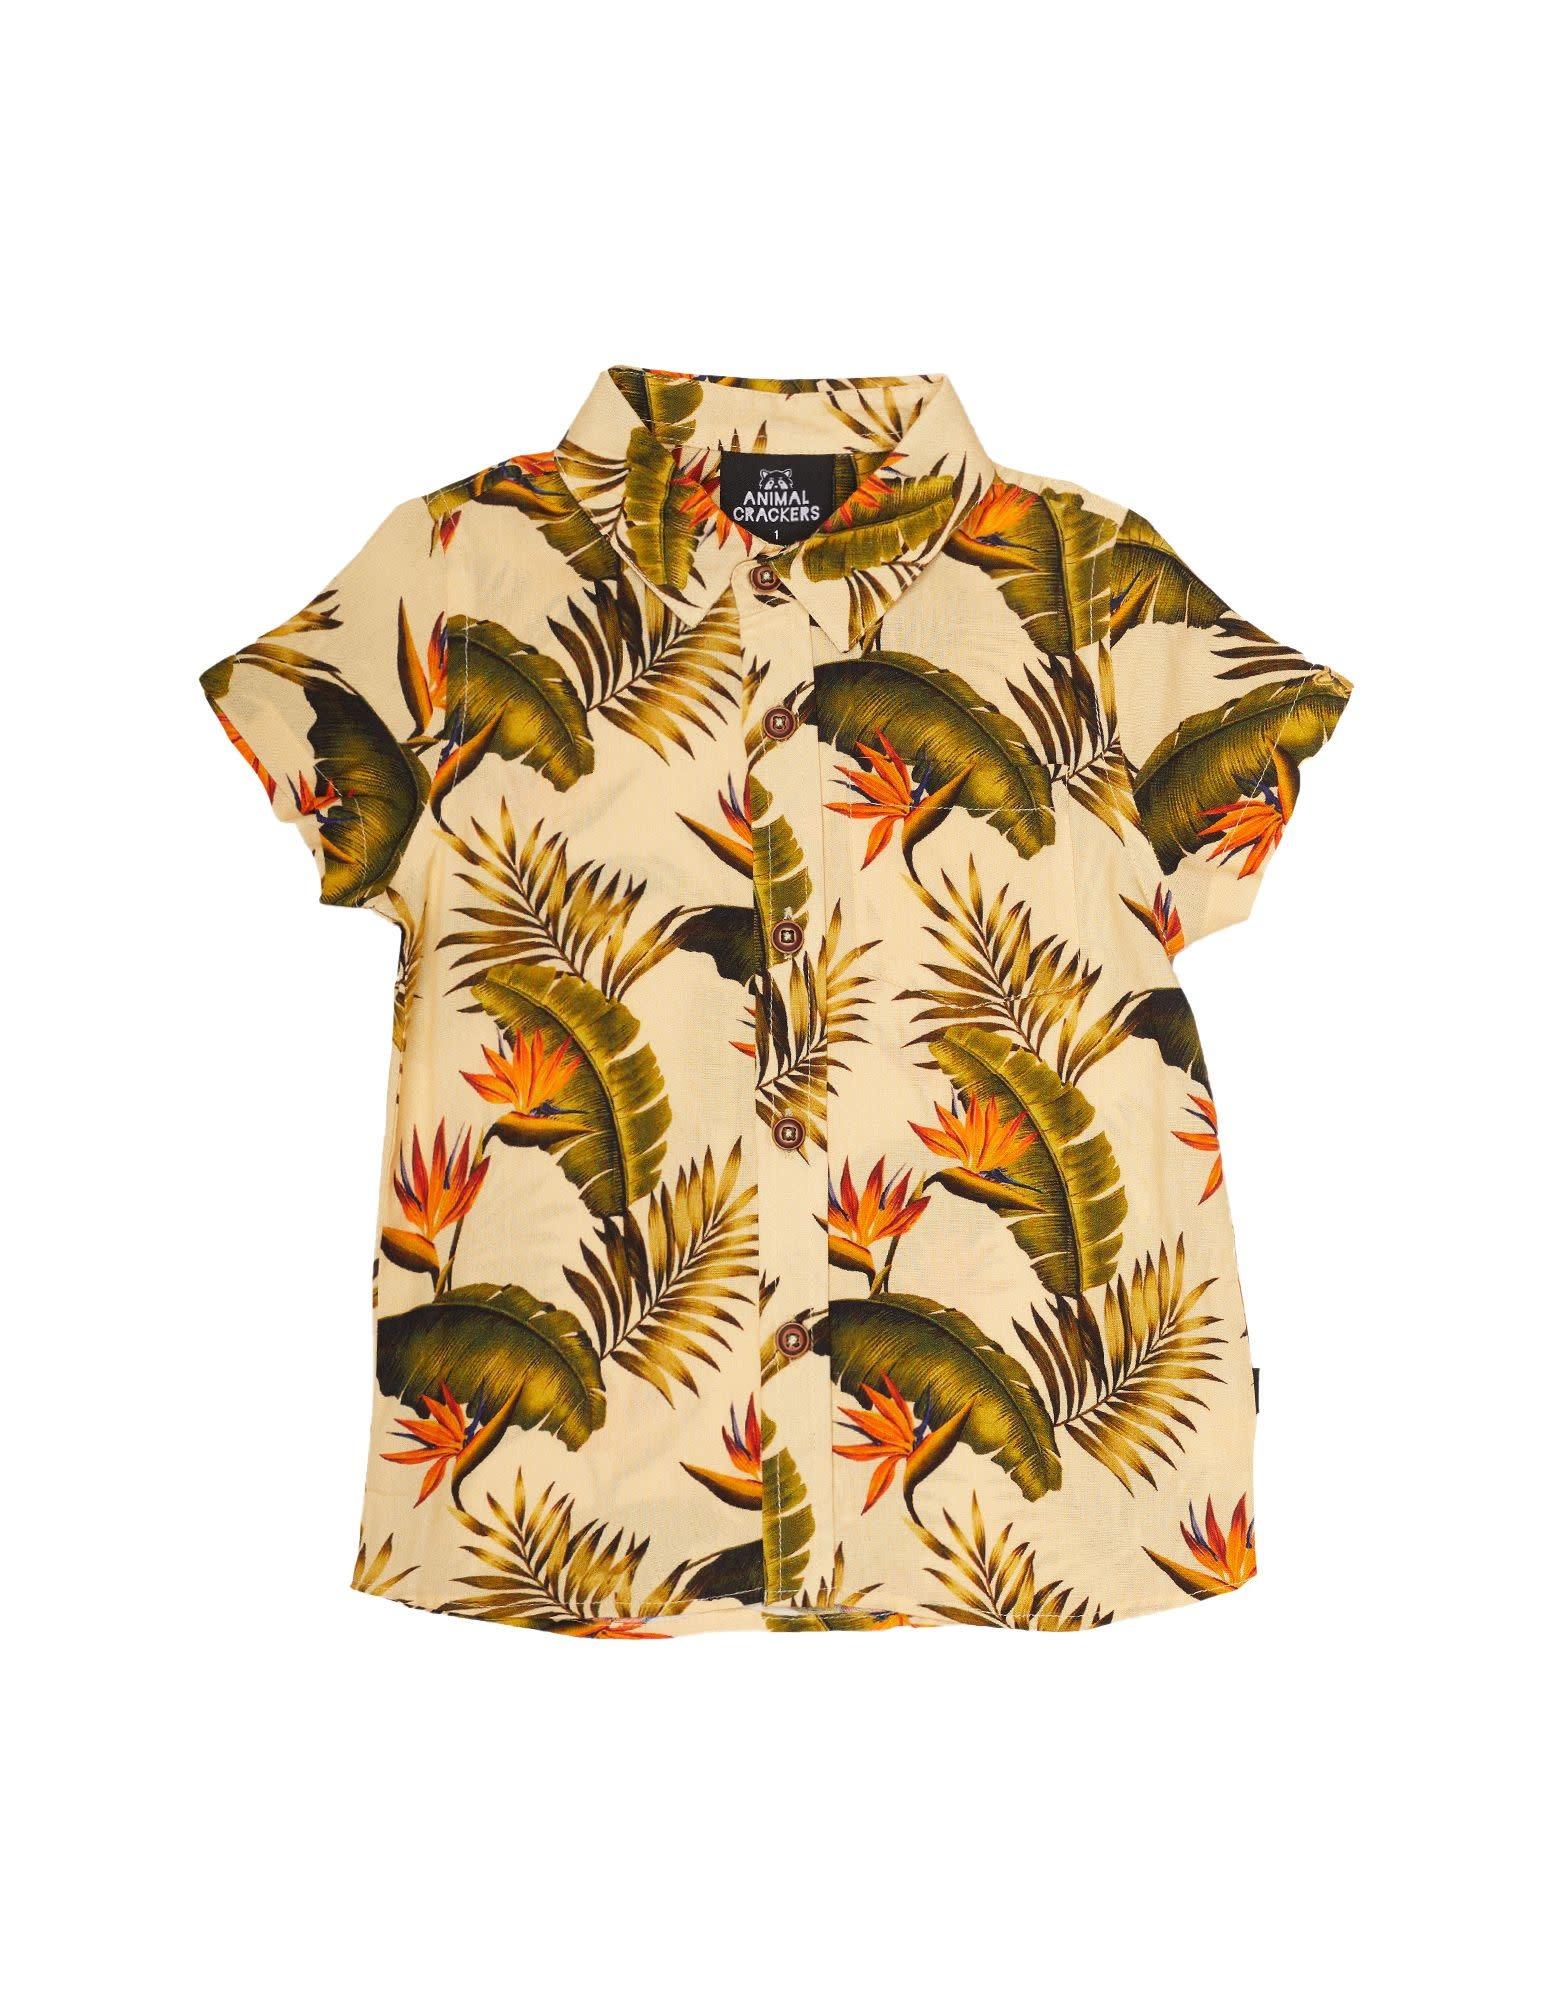 Animal Crackers Pacific SS Shirt